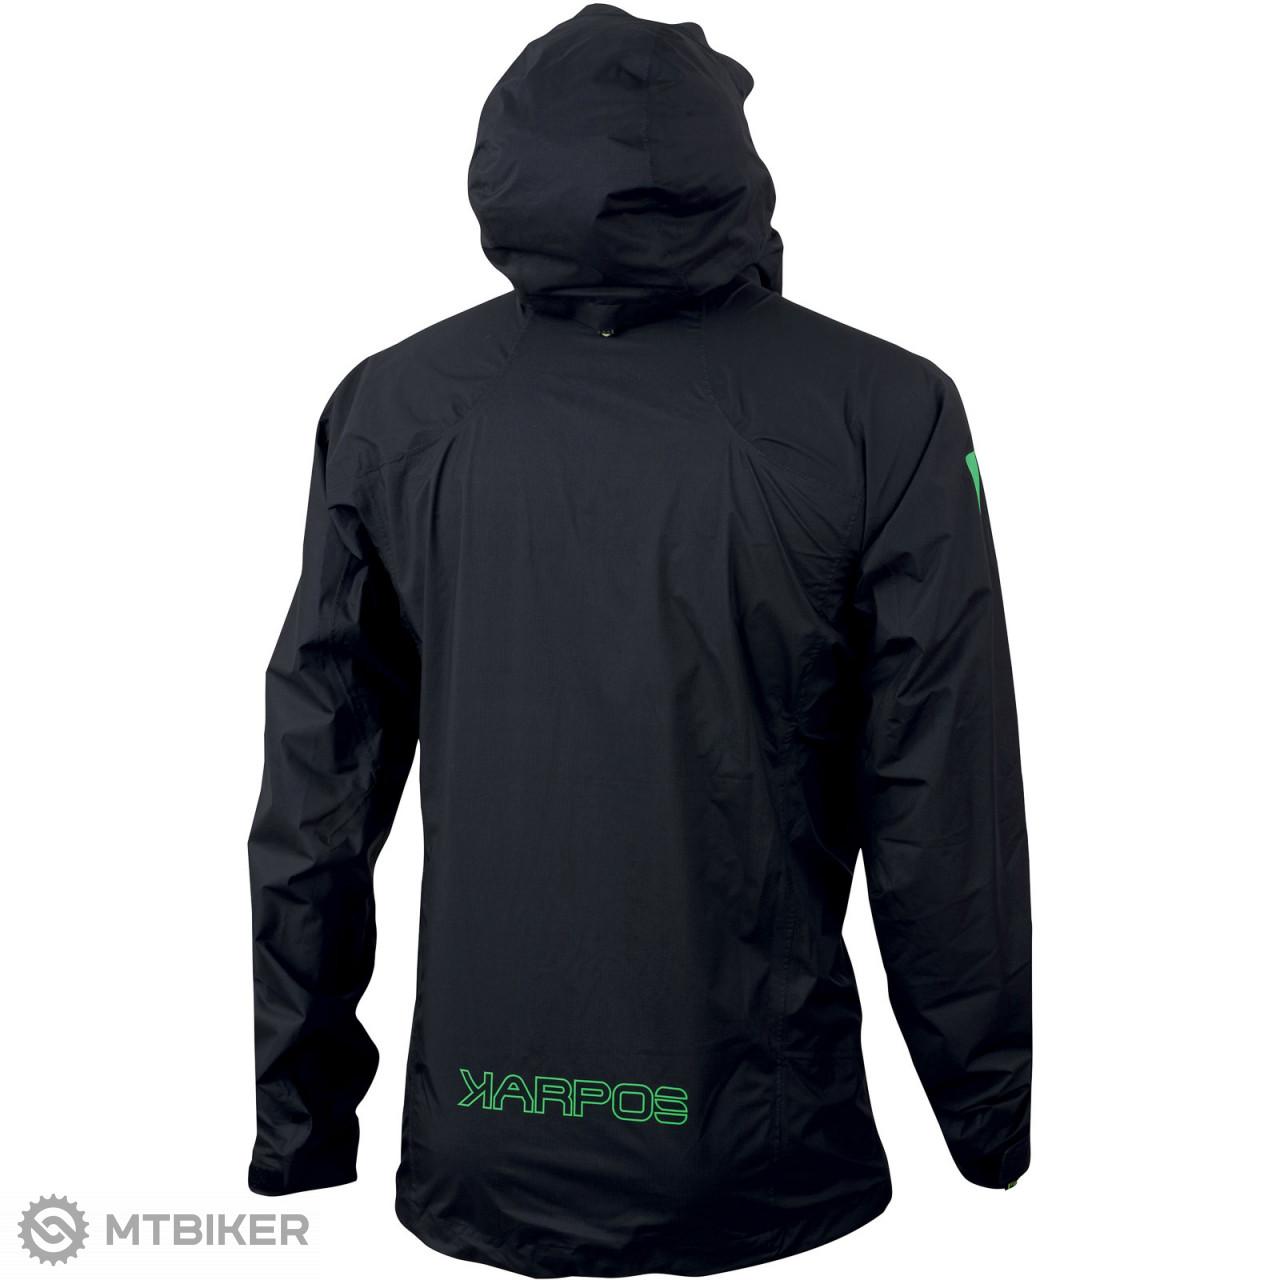 Karpos LOT RAIN Highest bunda čierna - MTBIKER Shop 860f66a09b6